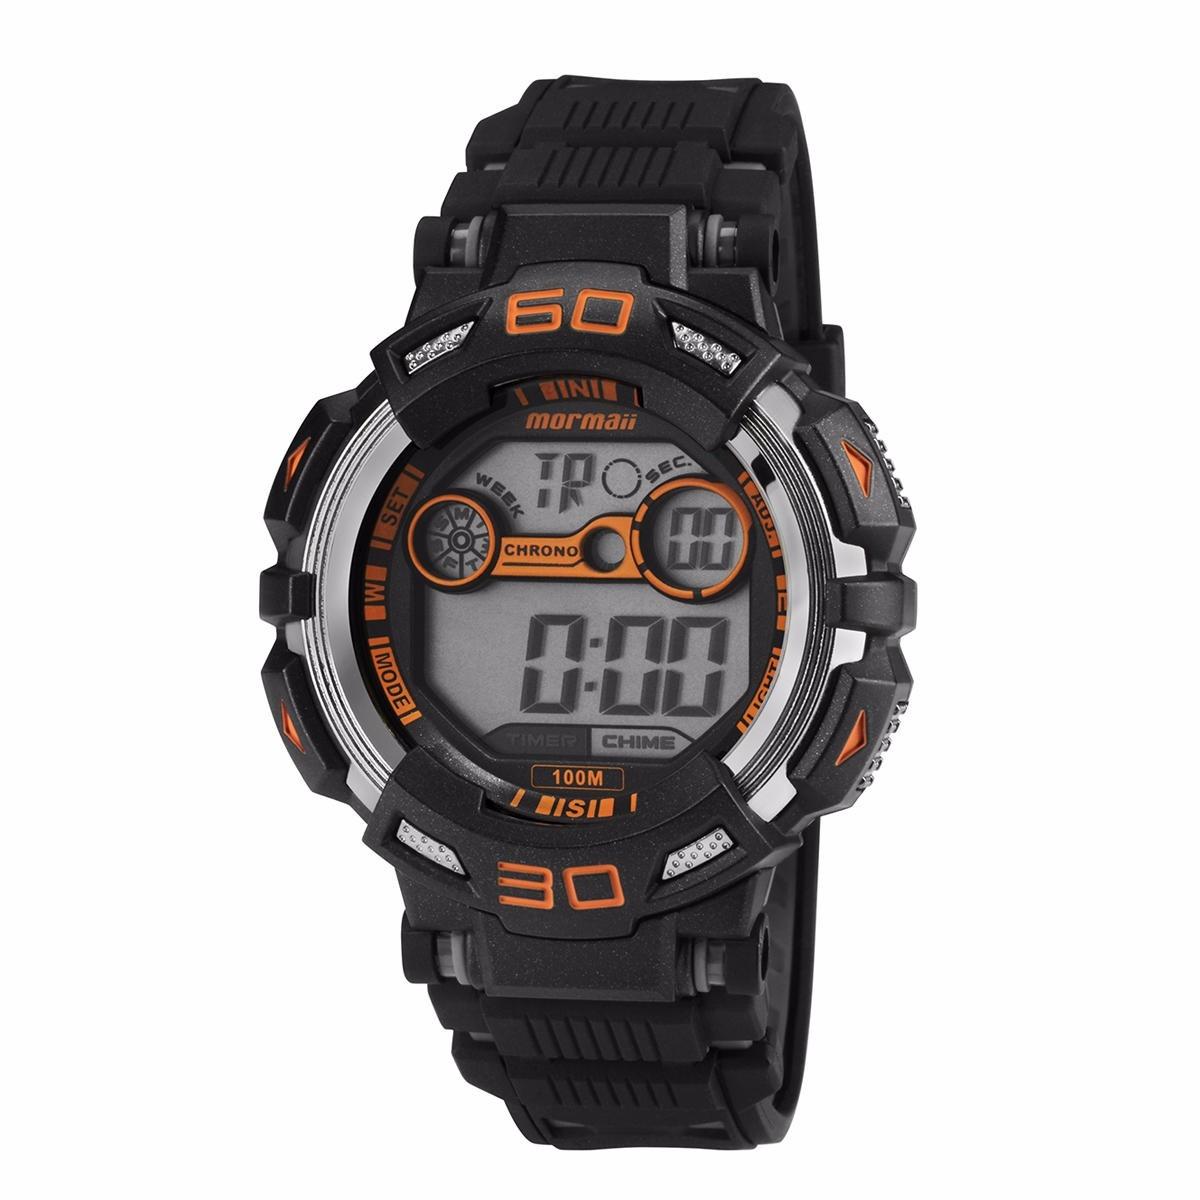 c1aa92d36a relógio mormaii acqua pro mo1001a 8l. Carregando zoom.